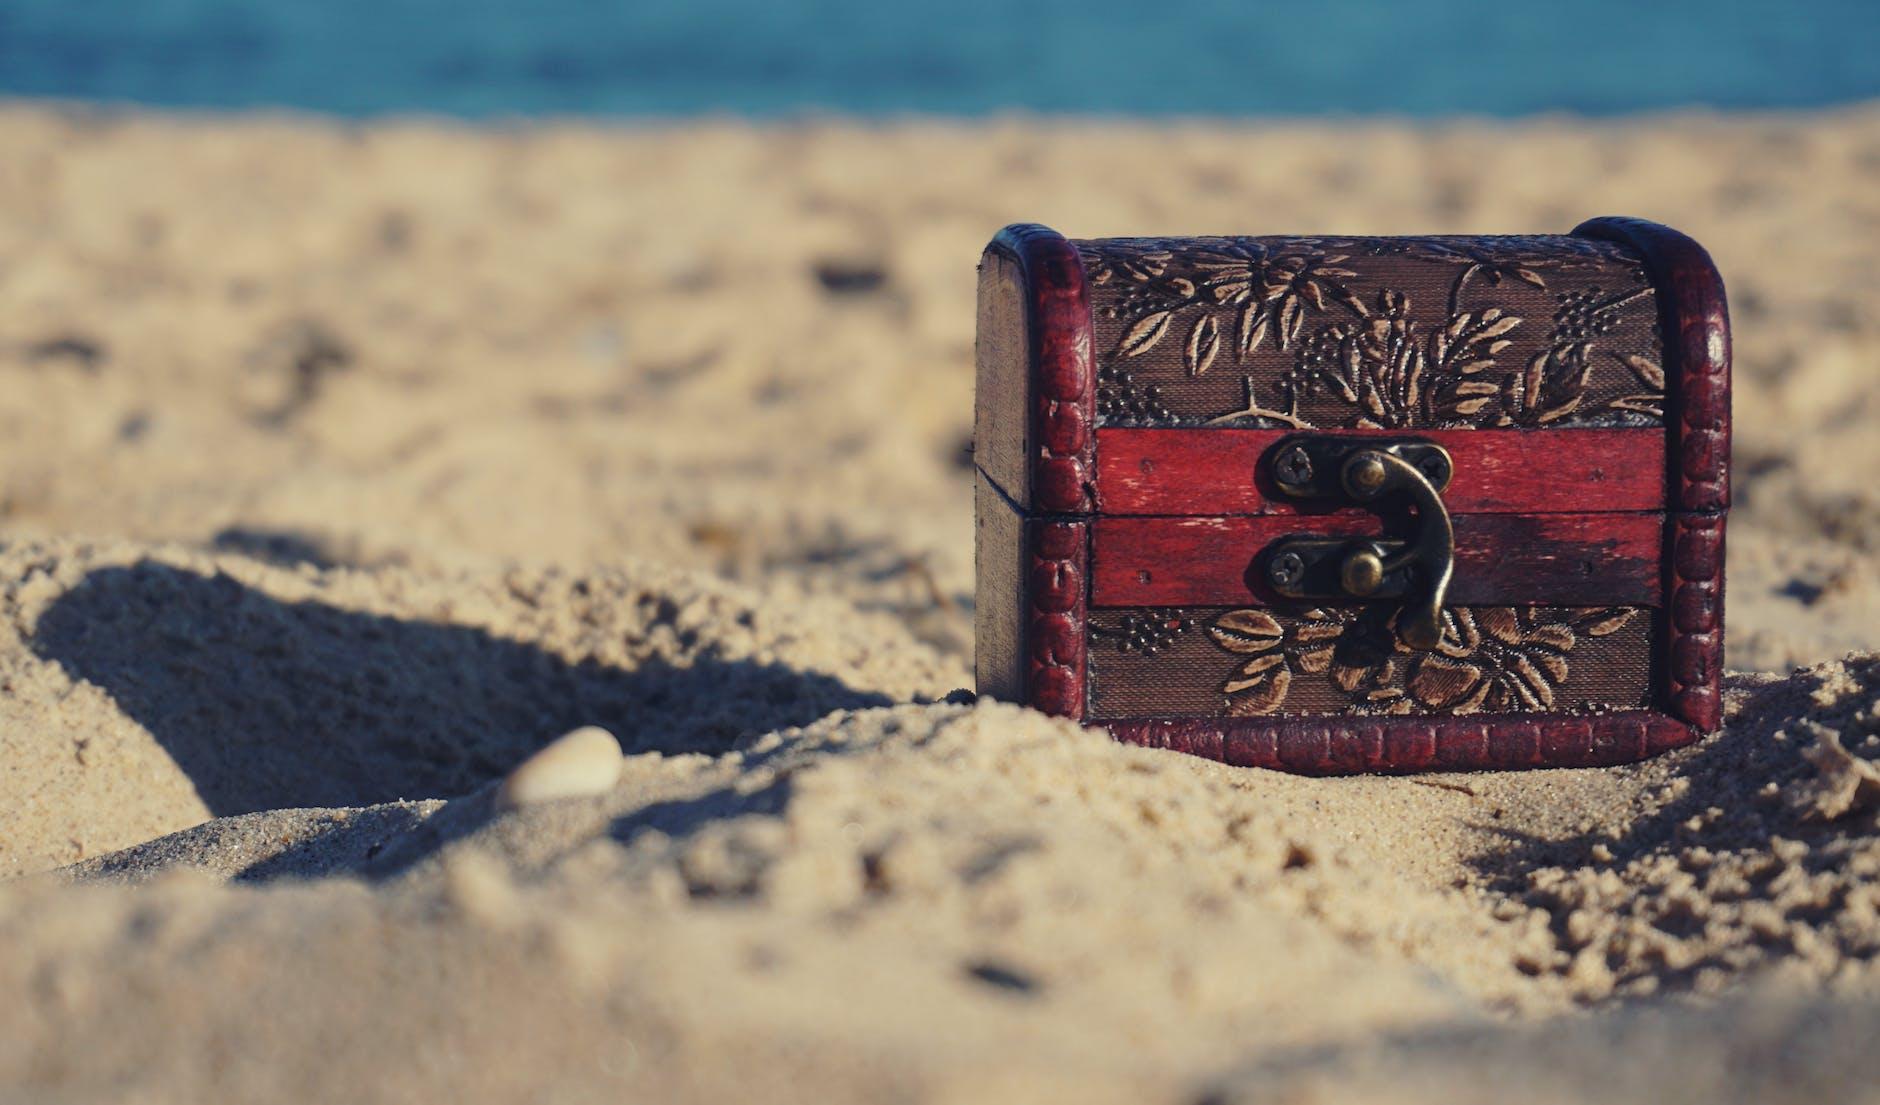 A small treasure chest on a beach